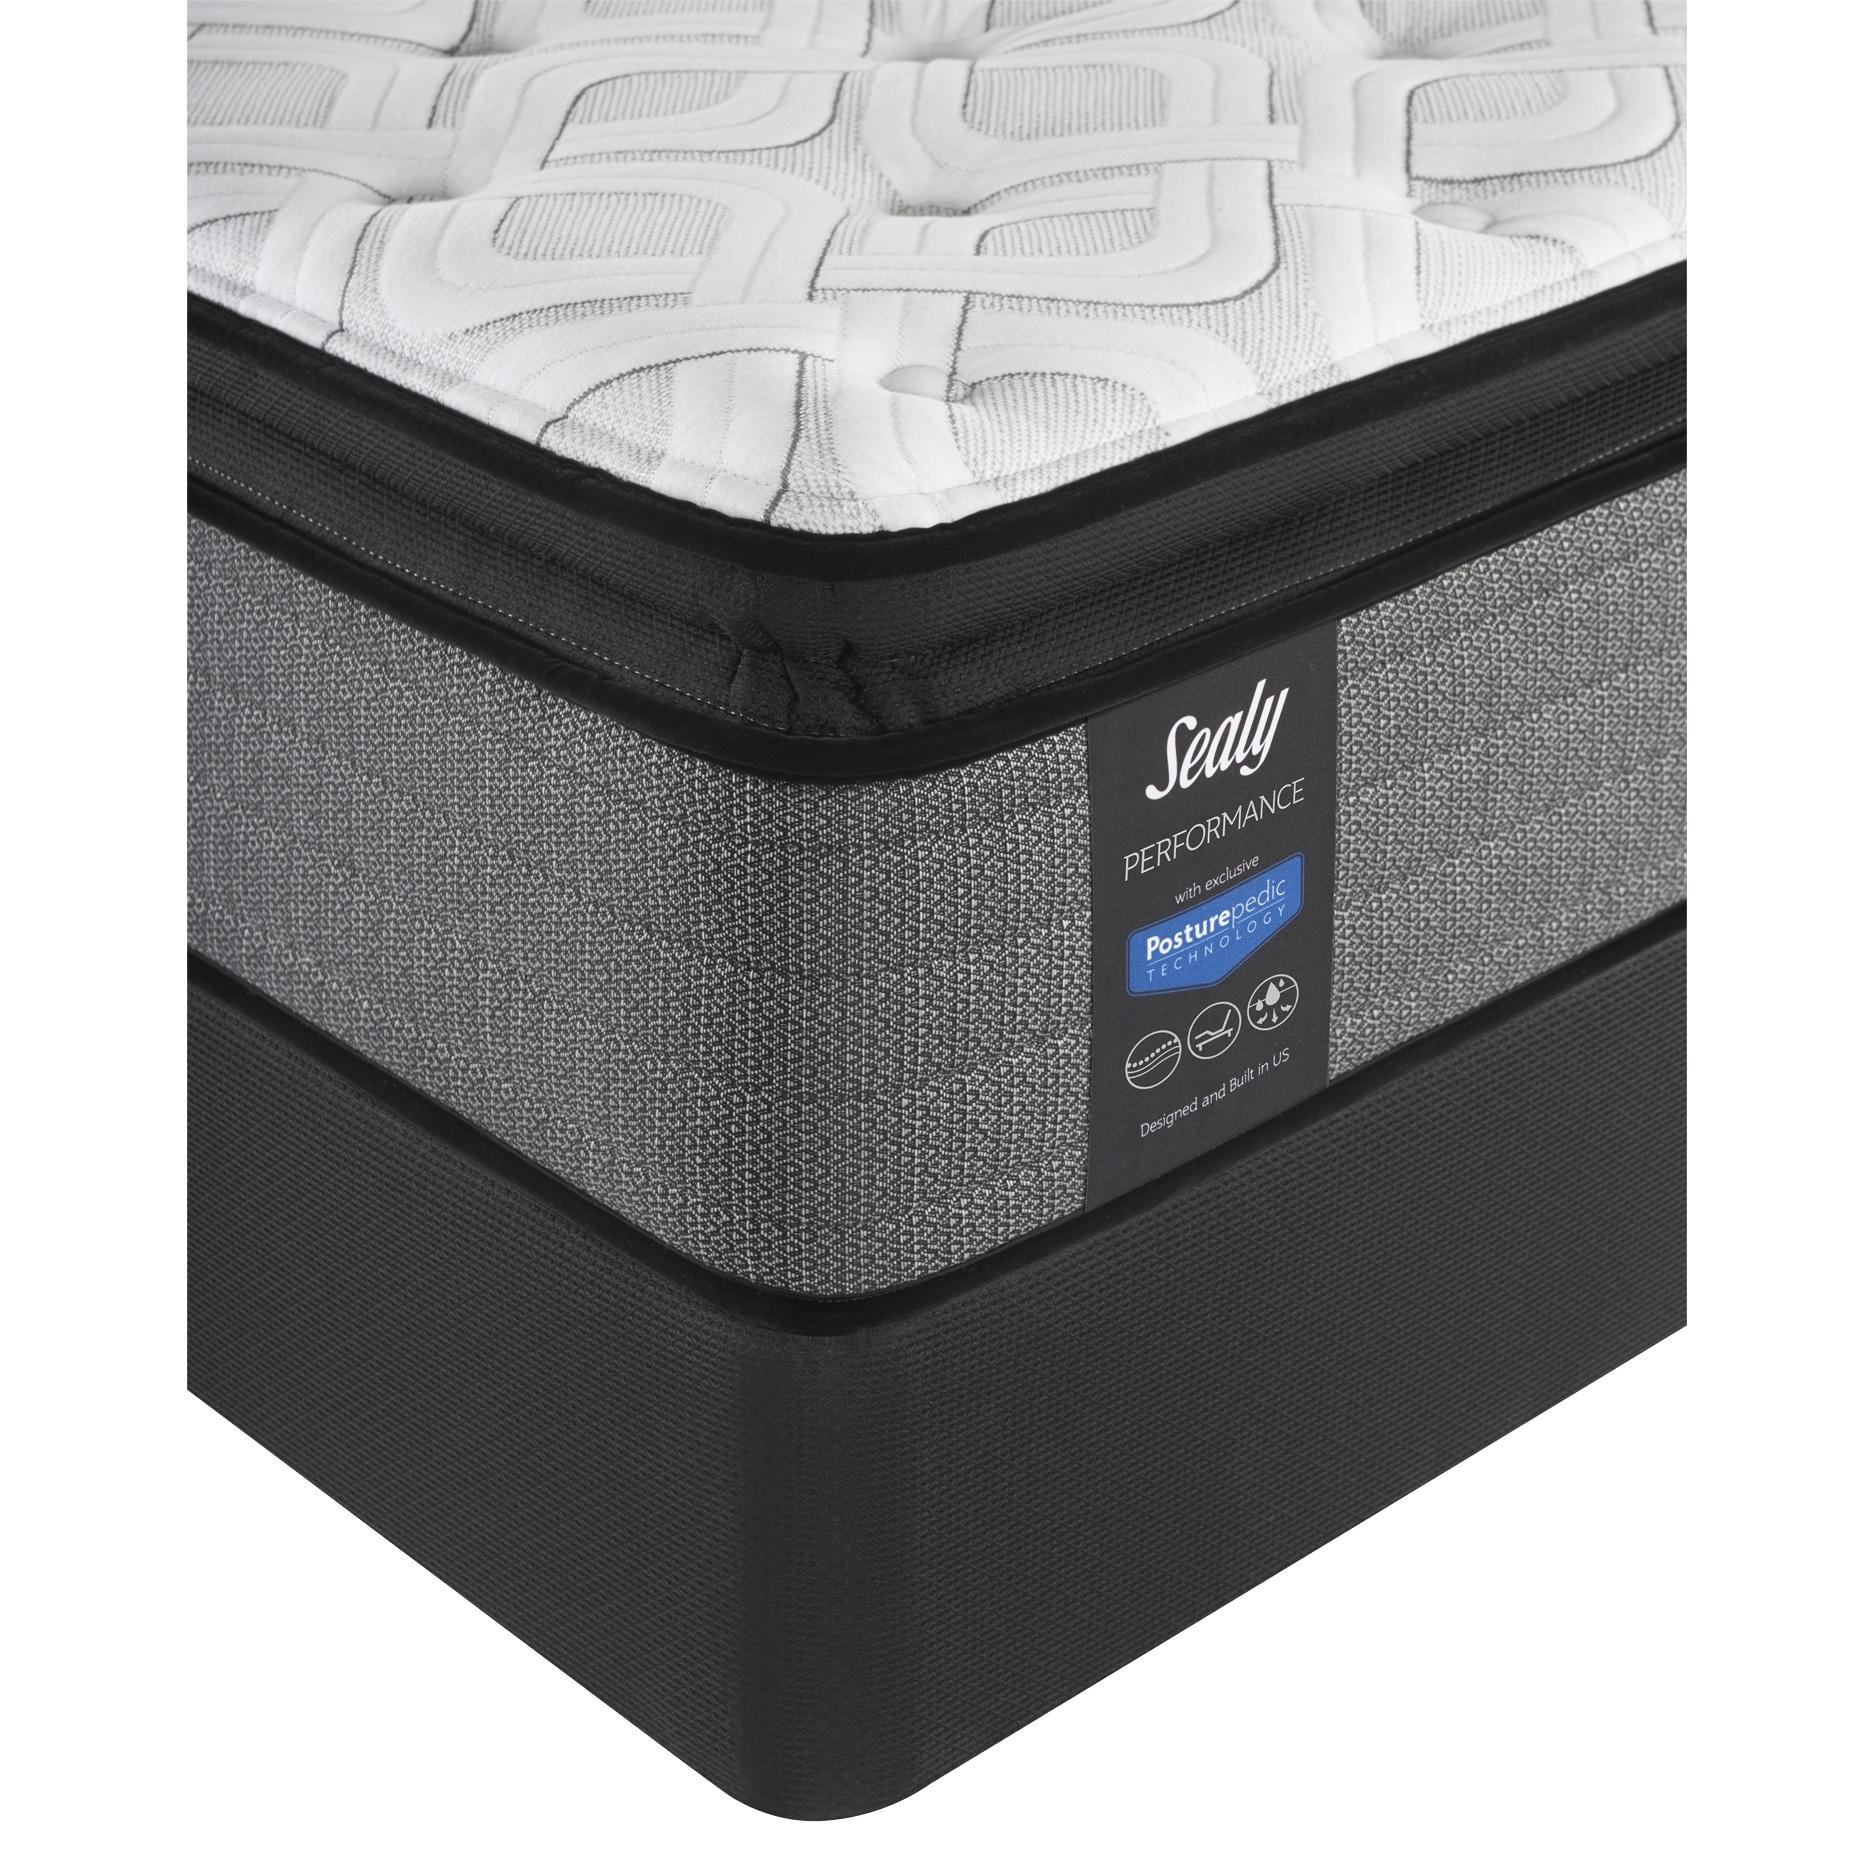 sealy response performance 14 inch plush euro pillow top california